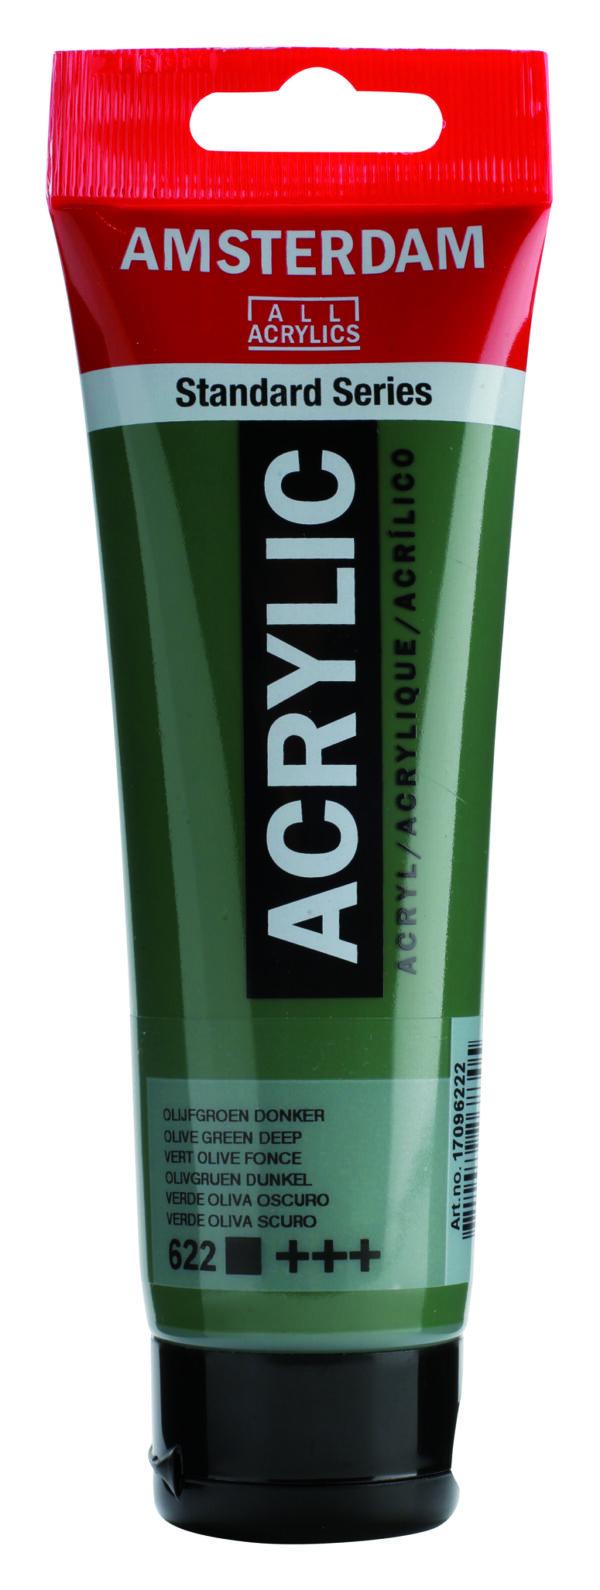 Ams std 622 Olive green Deep - 120 ml